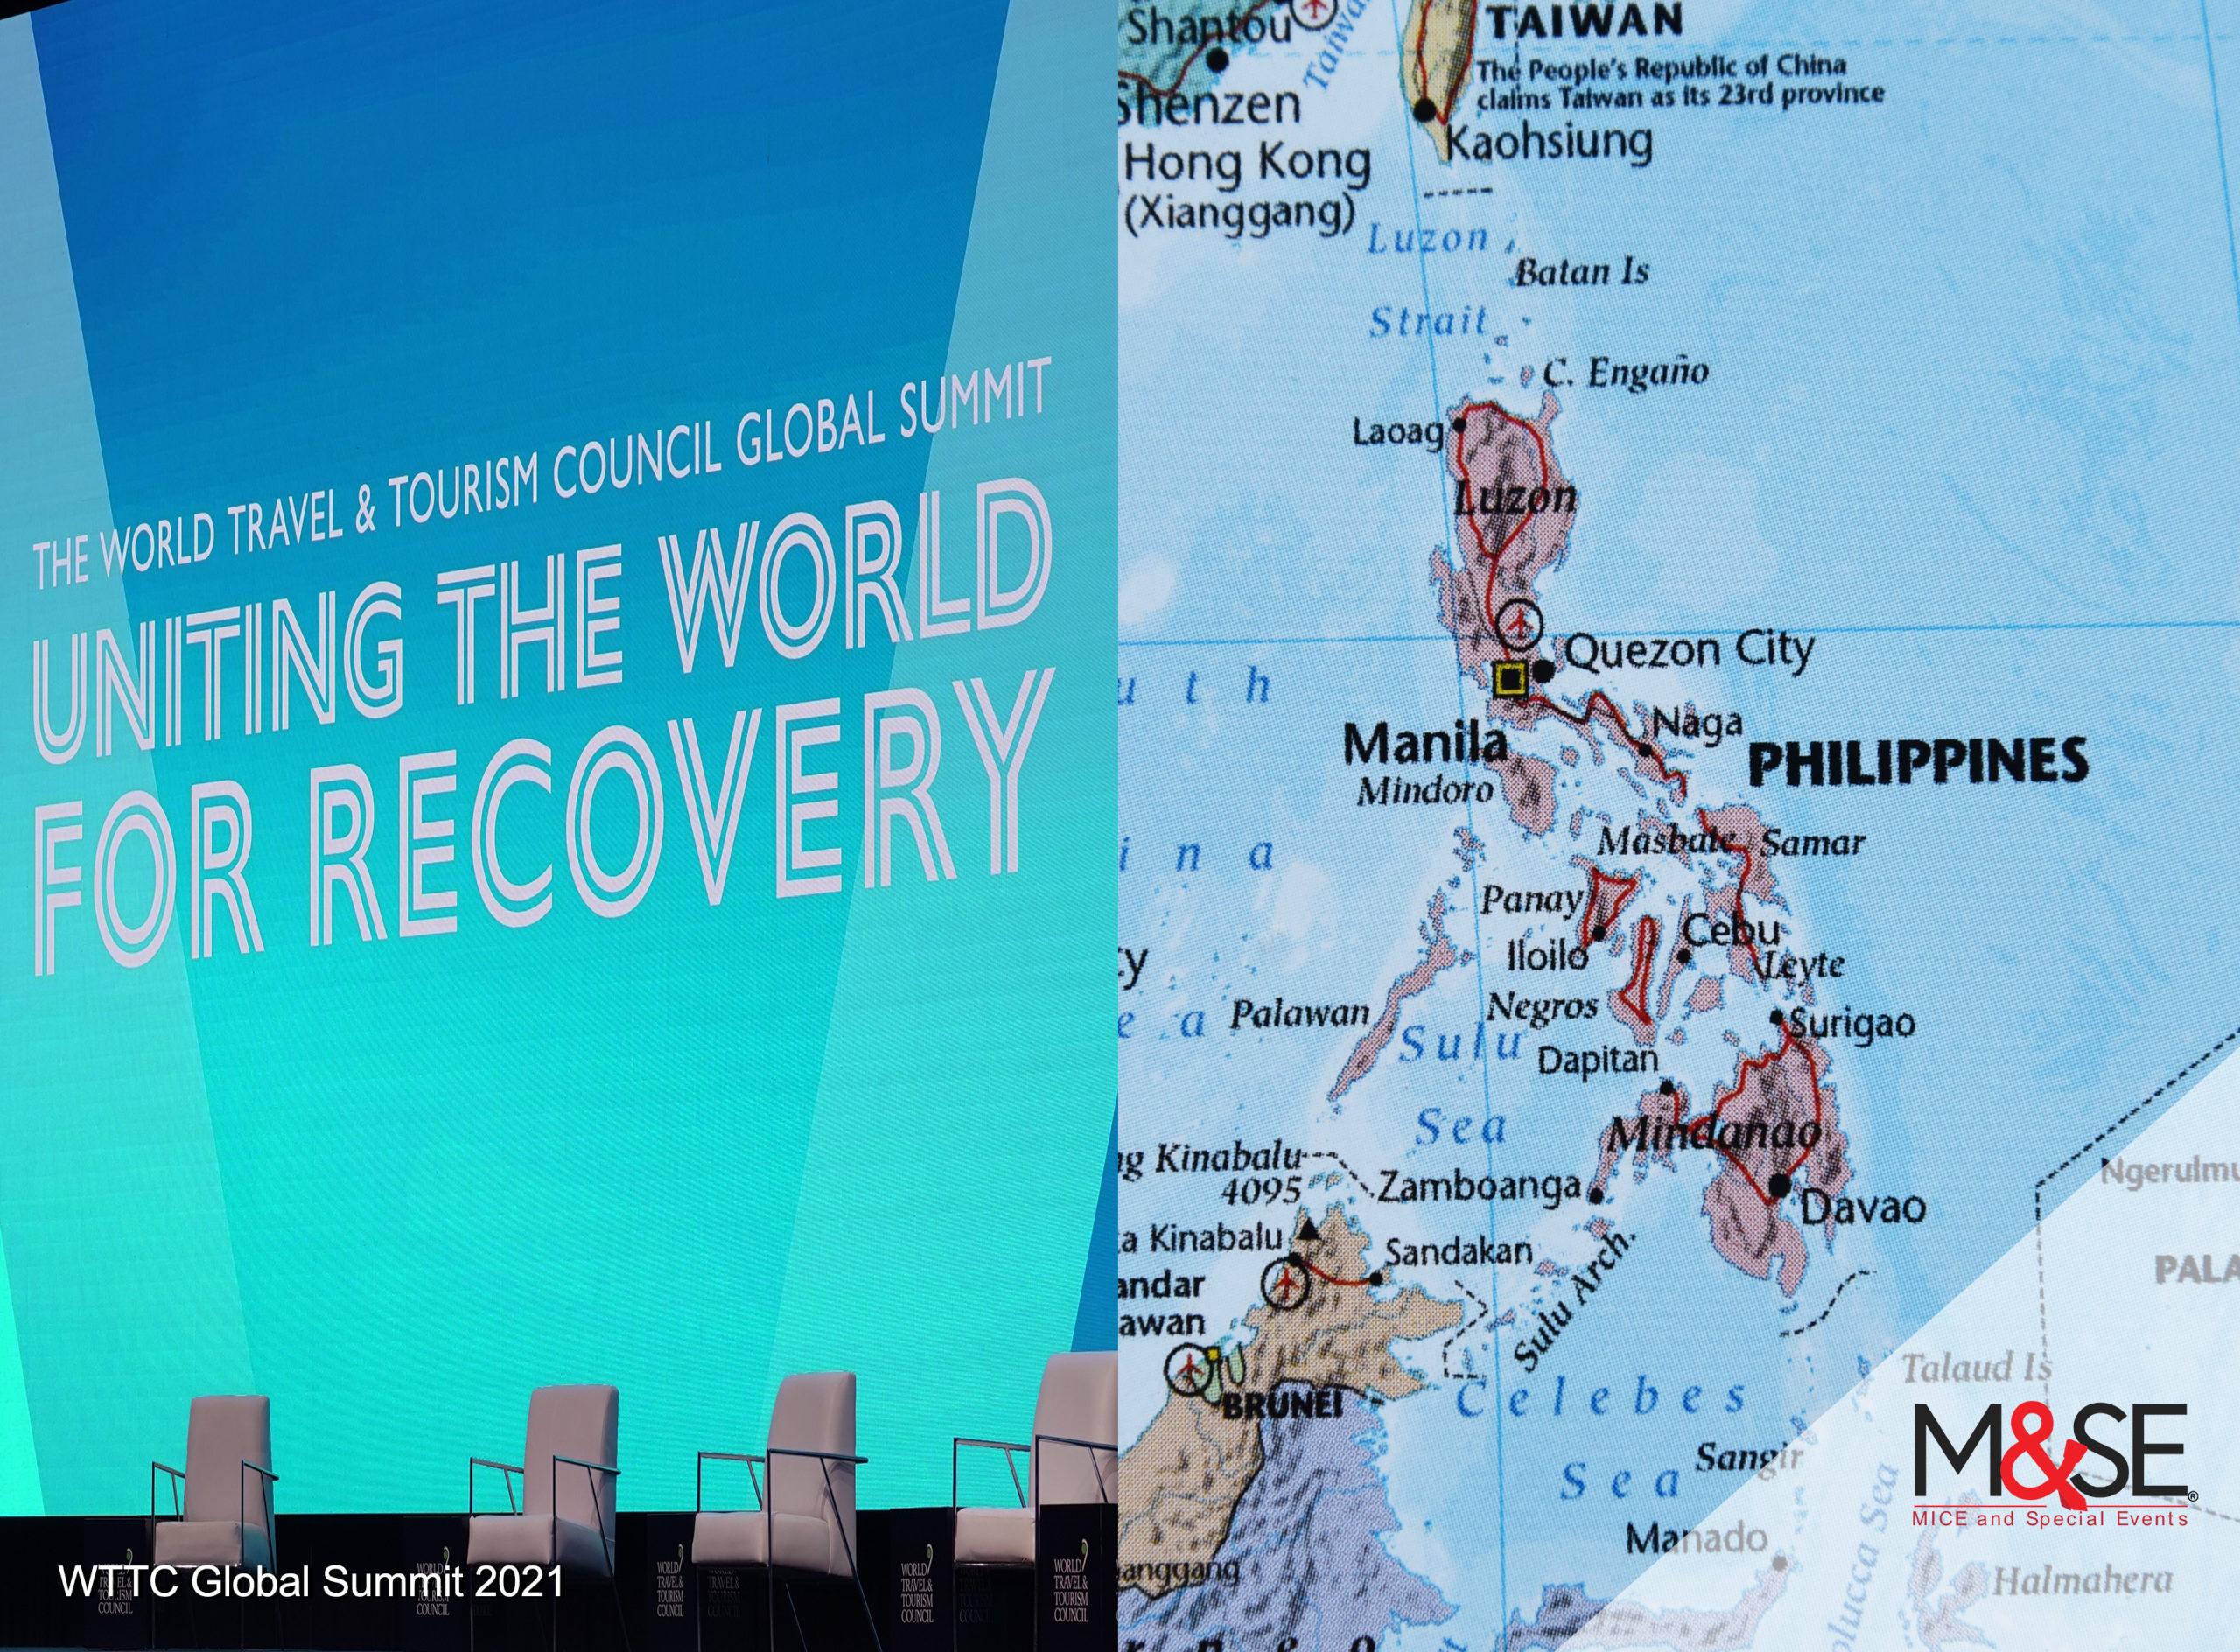 WTTC Global Summit Philippines